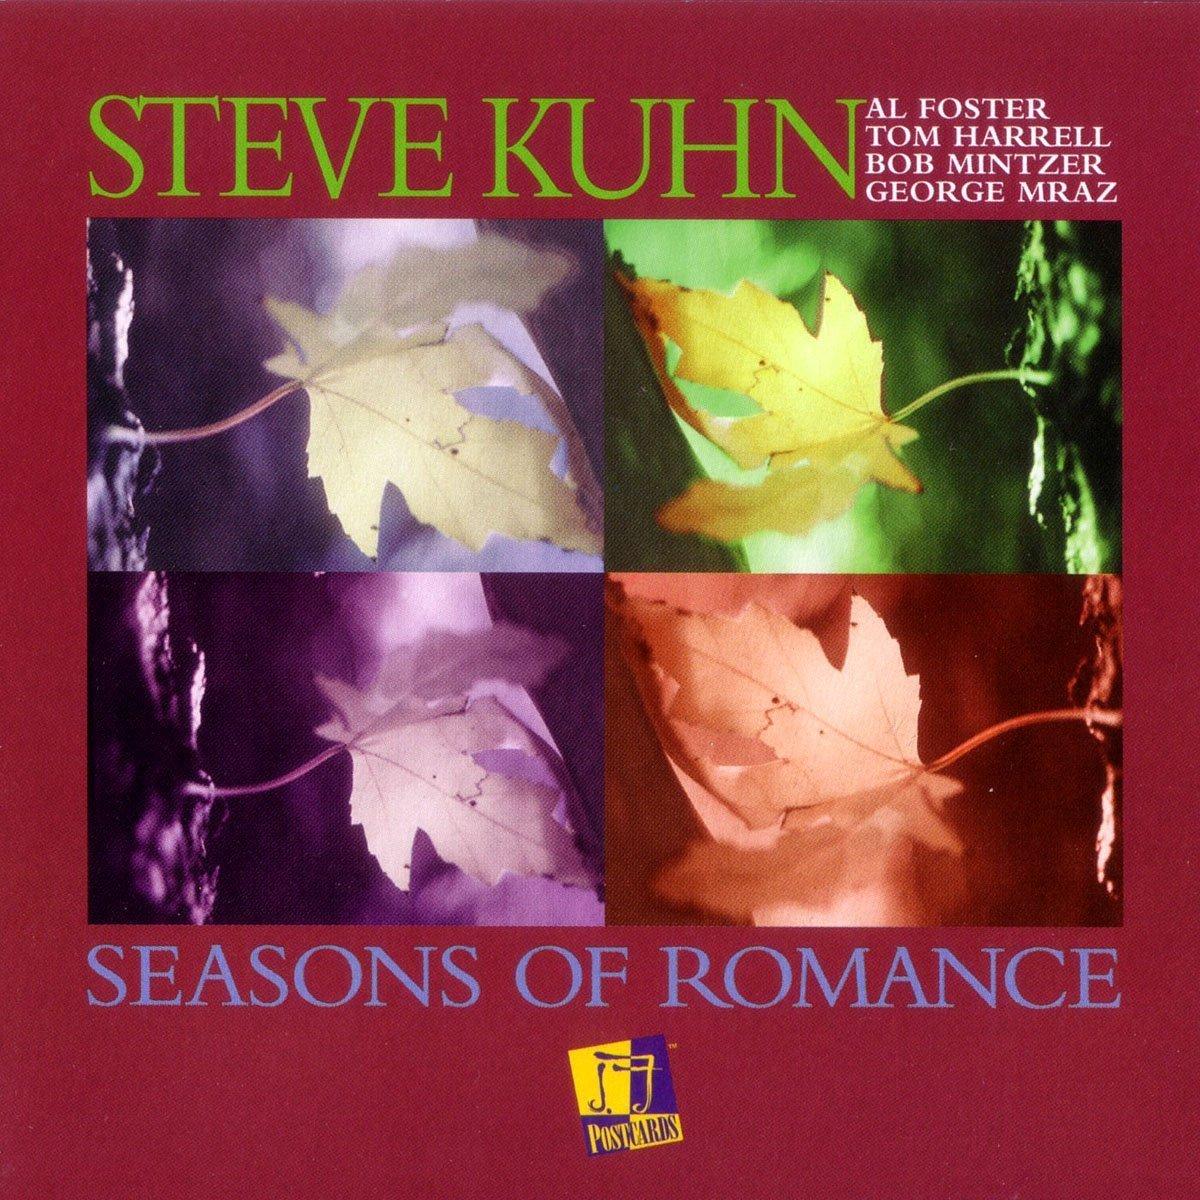 STEVE KUHN: Seasons of Romance